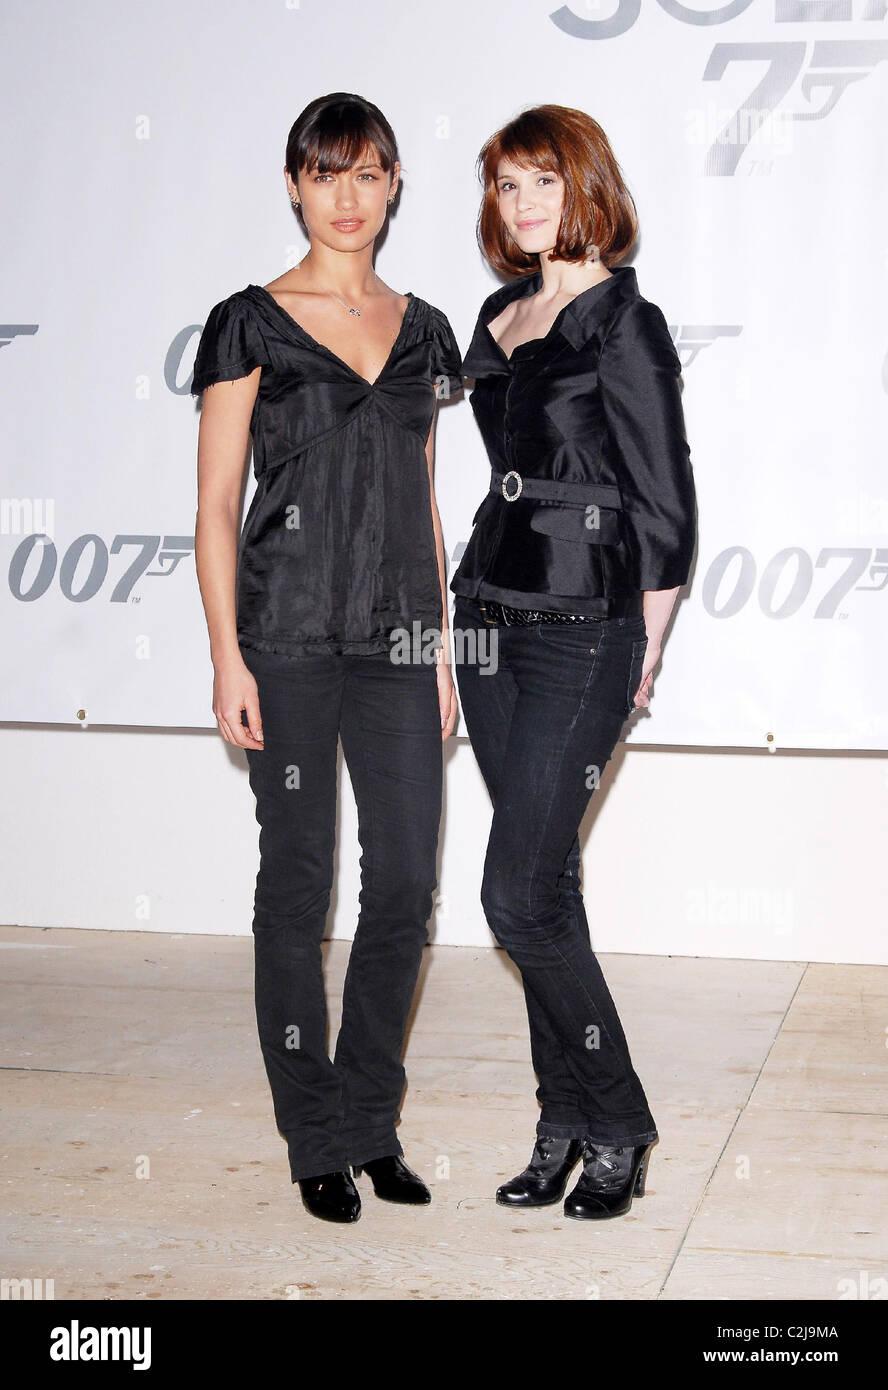 Olga Kurylenko Und Gemma Arterton James Bond 007 Fototermin Für